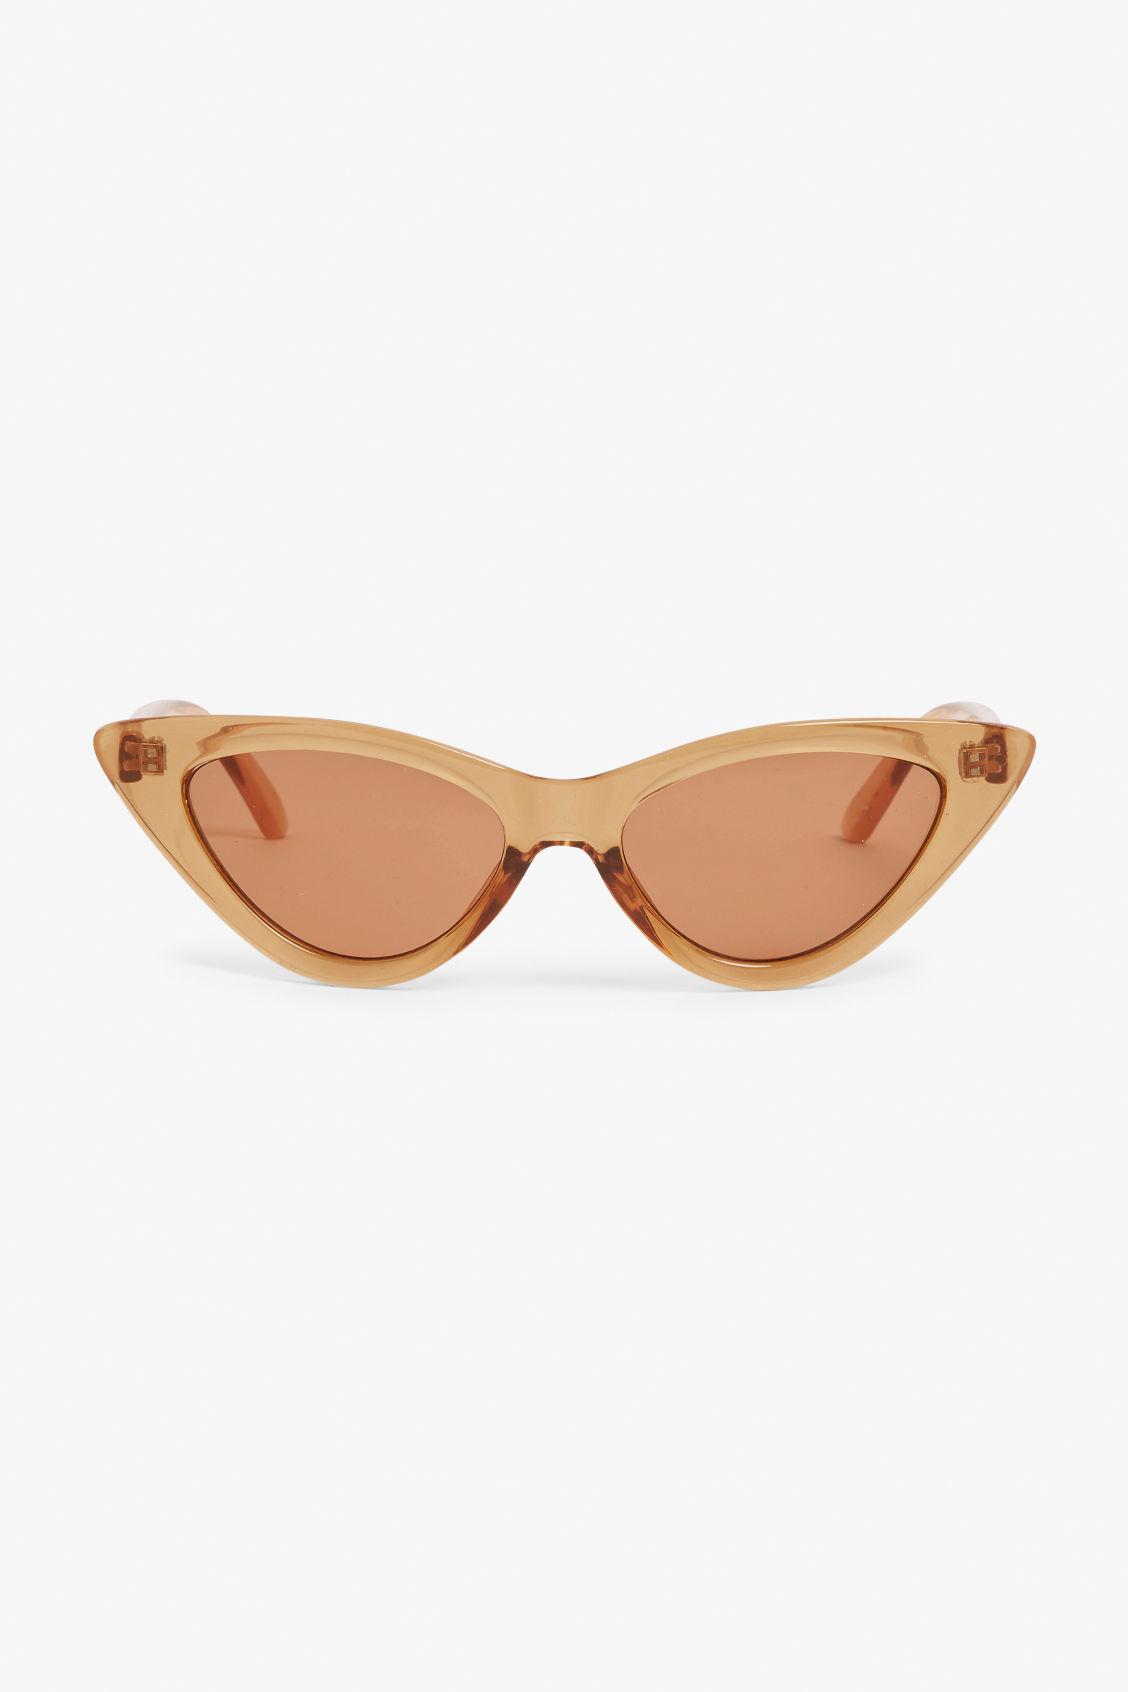 13aeebd2a2 Cat eye sunglasses - Black magic - Sunglasses - Monki